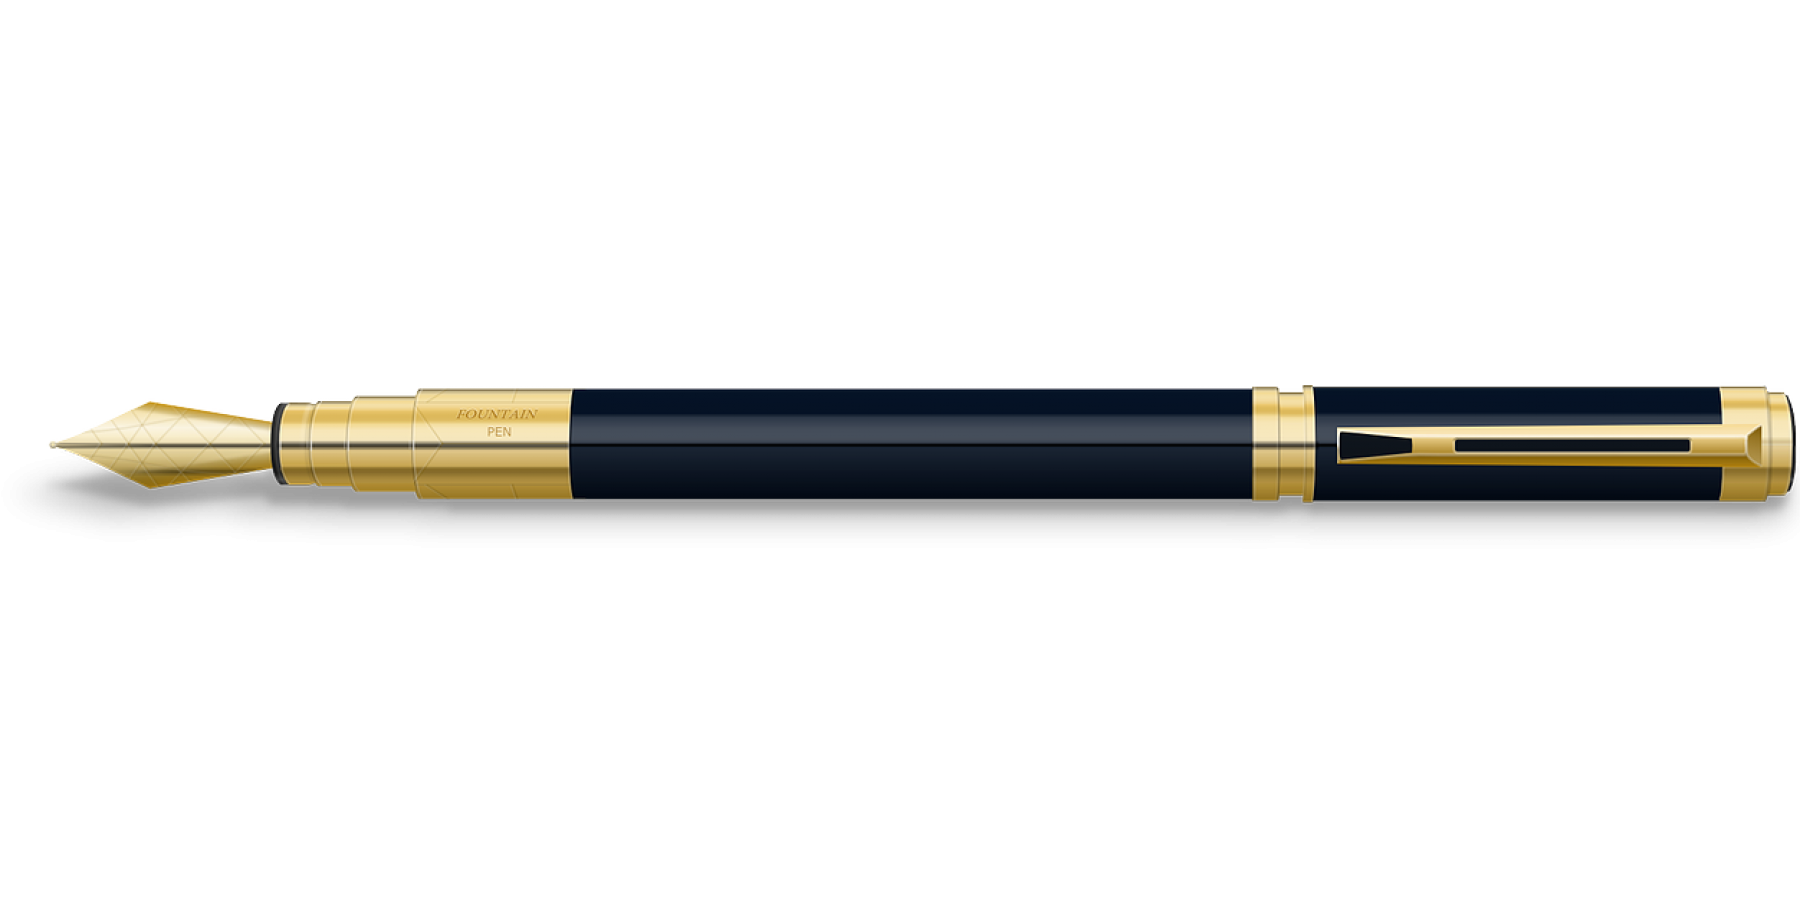 05_pen-filler-156146_1280